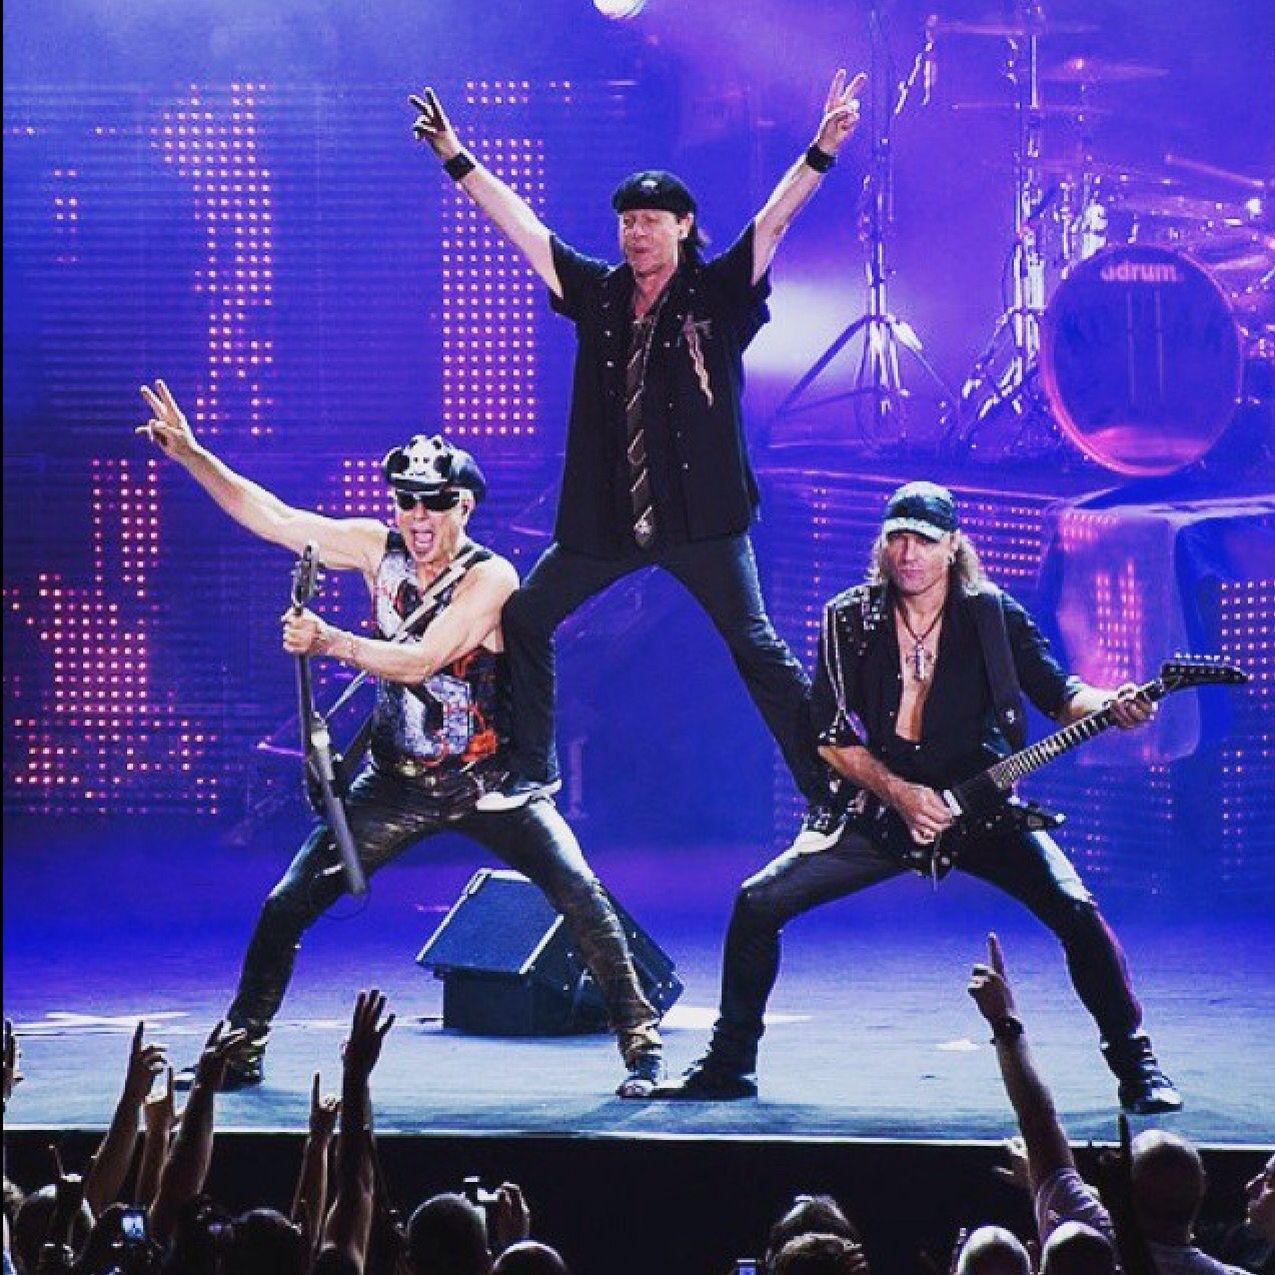 Klaus Meine. Scorpions. | Scorpions band, Hard rock, Klaus